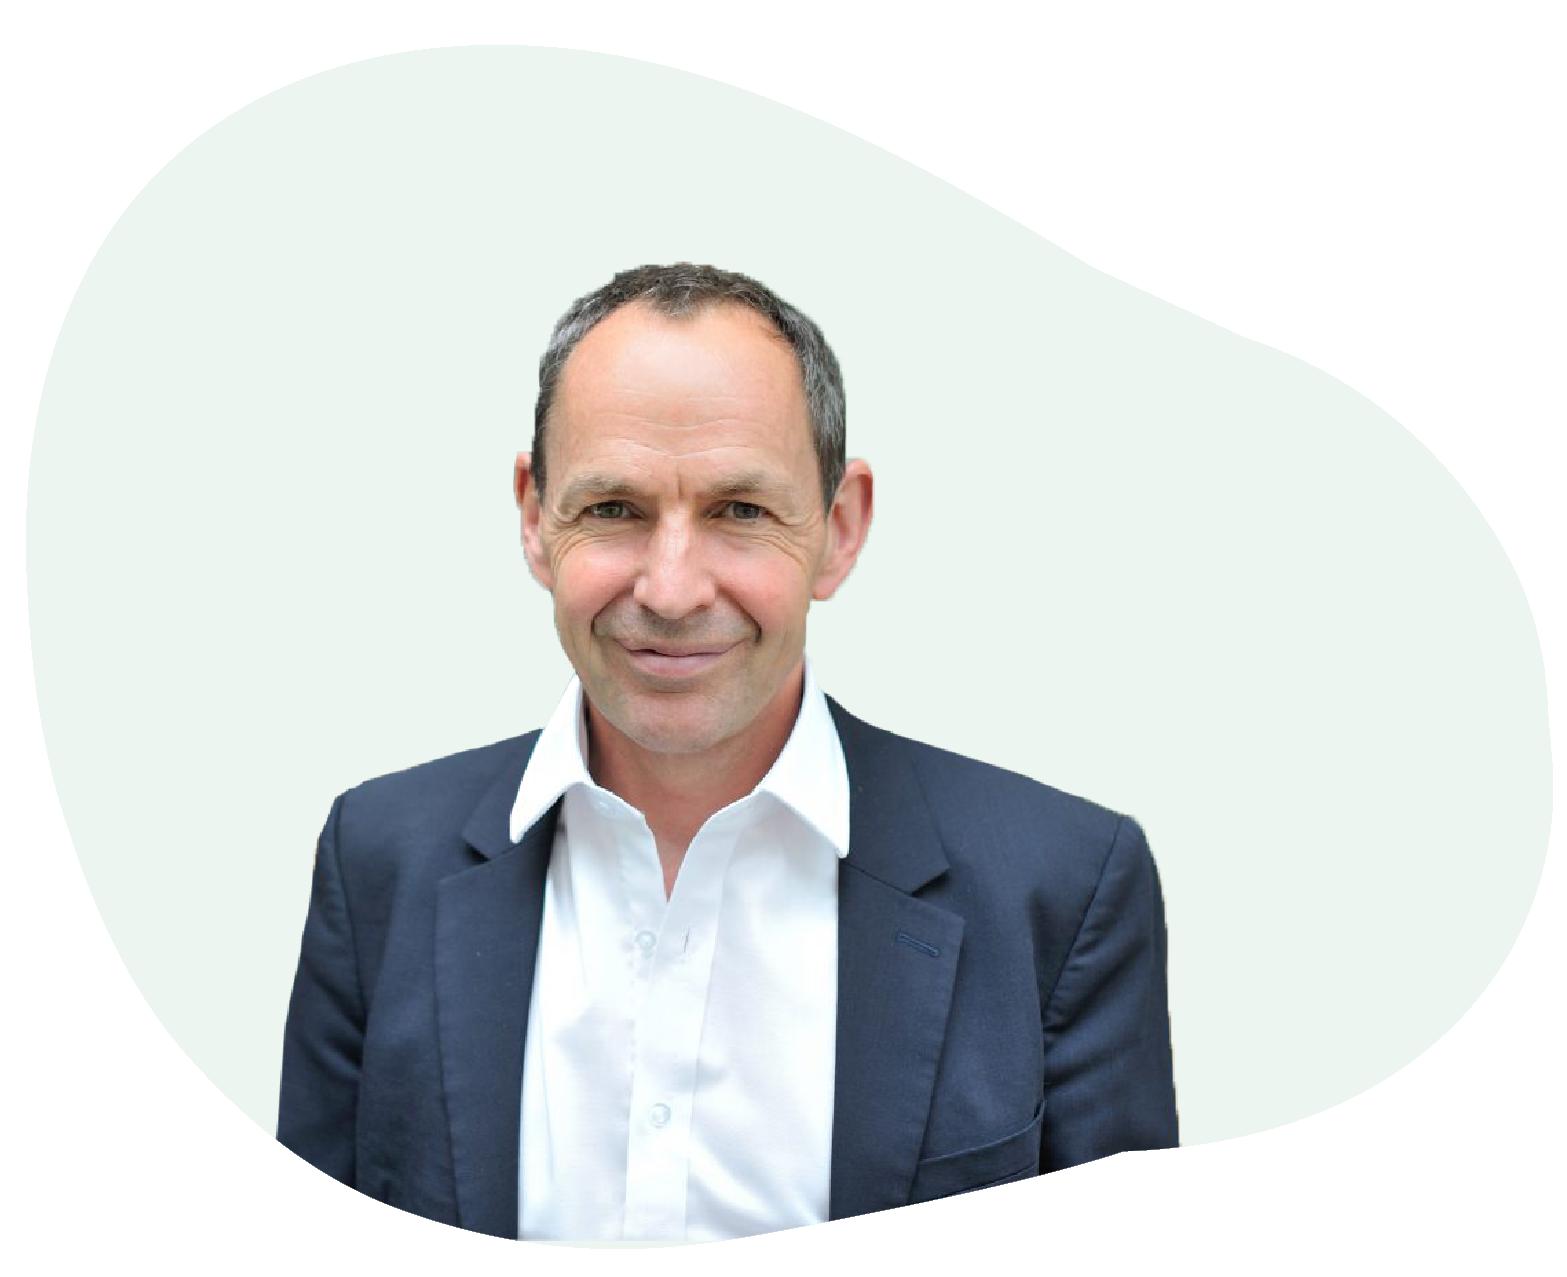 Headshot of Professor Mike Berners-Lee